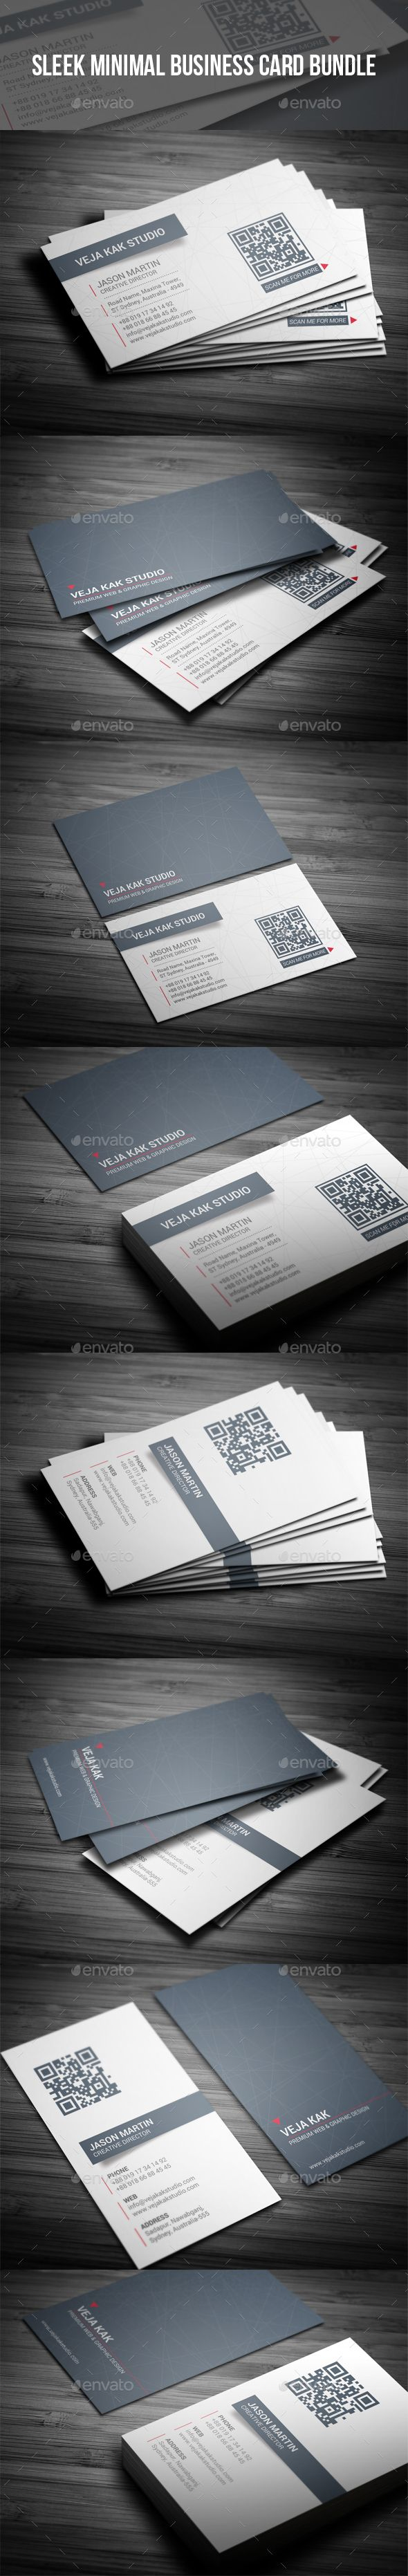 Sleek Minimal Business Card Template PSD Bundle